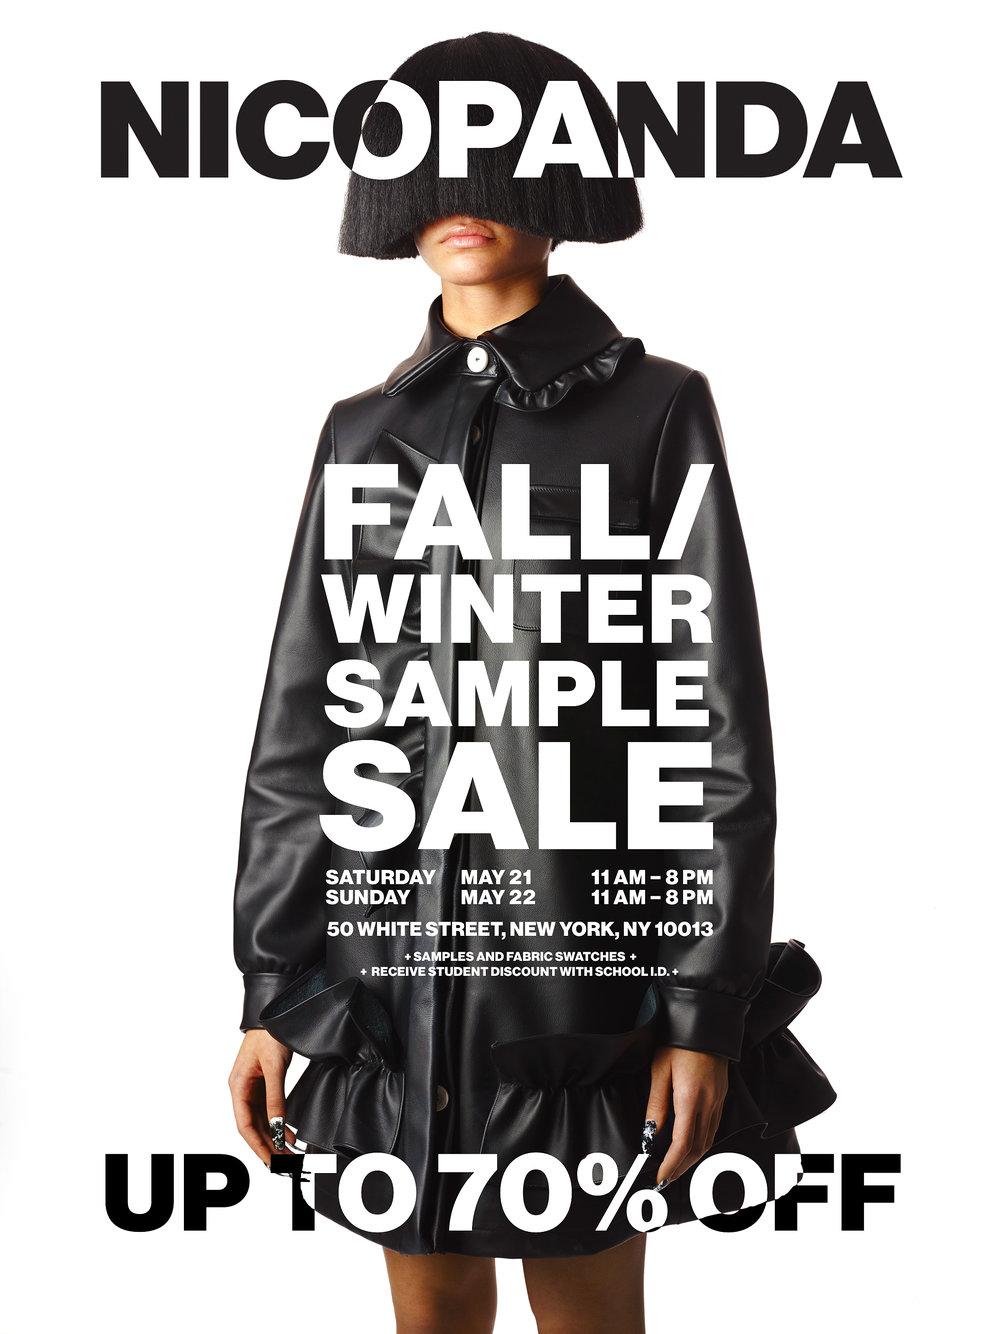 Nicopanda_FWSampleSale-Flyer_2b.jpg